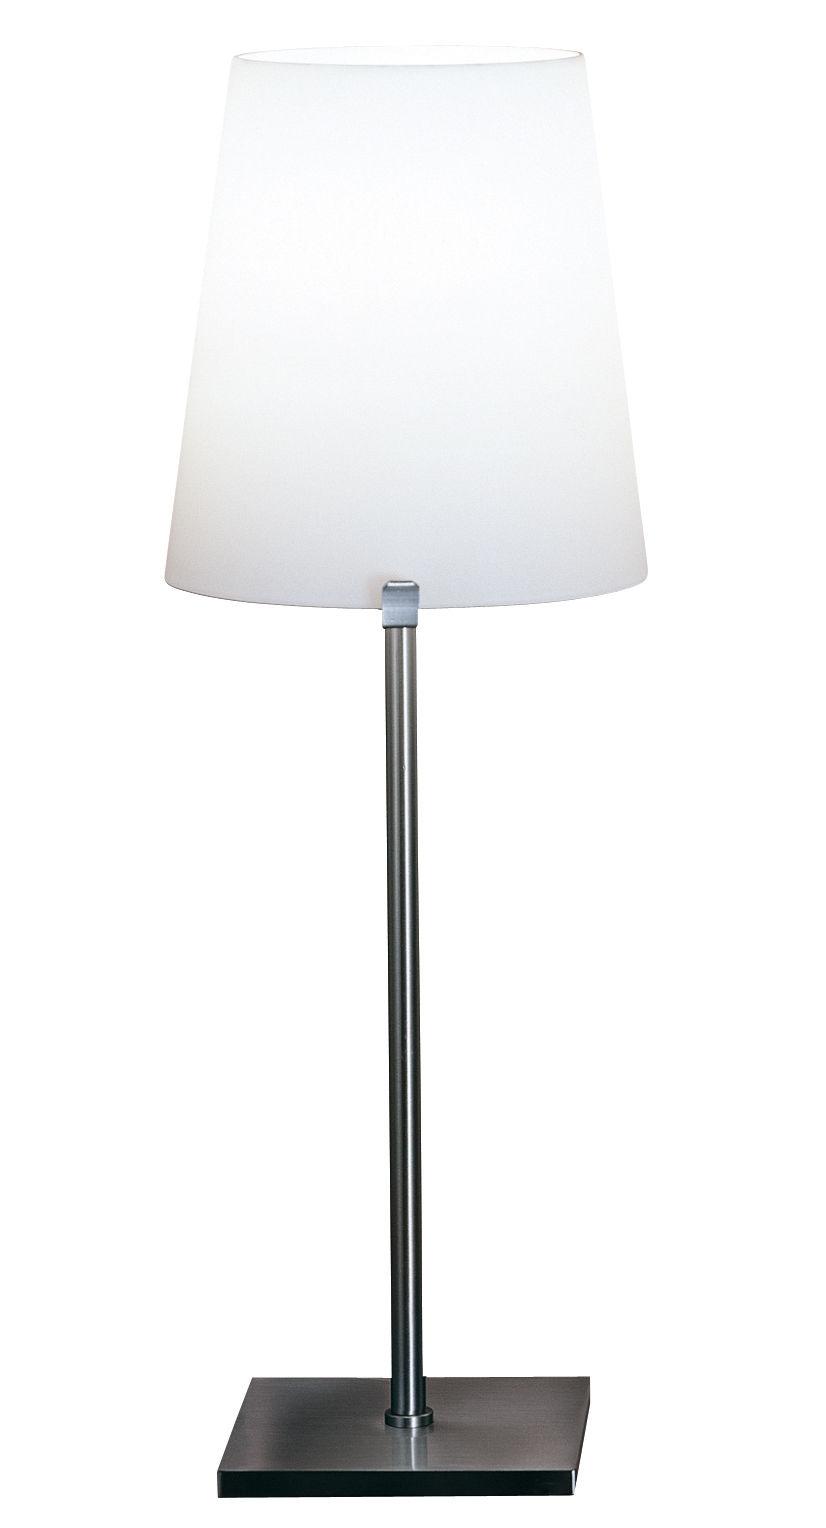 Luminaire - Lampes de table - Lampe de table Chiara - Fontana Arte - Blanc - Acier inoxydable brossé, Verre soufflé